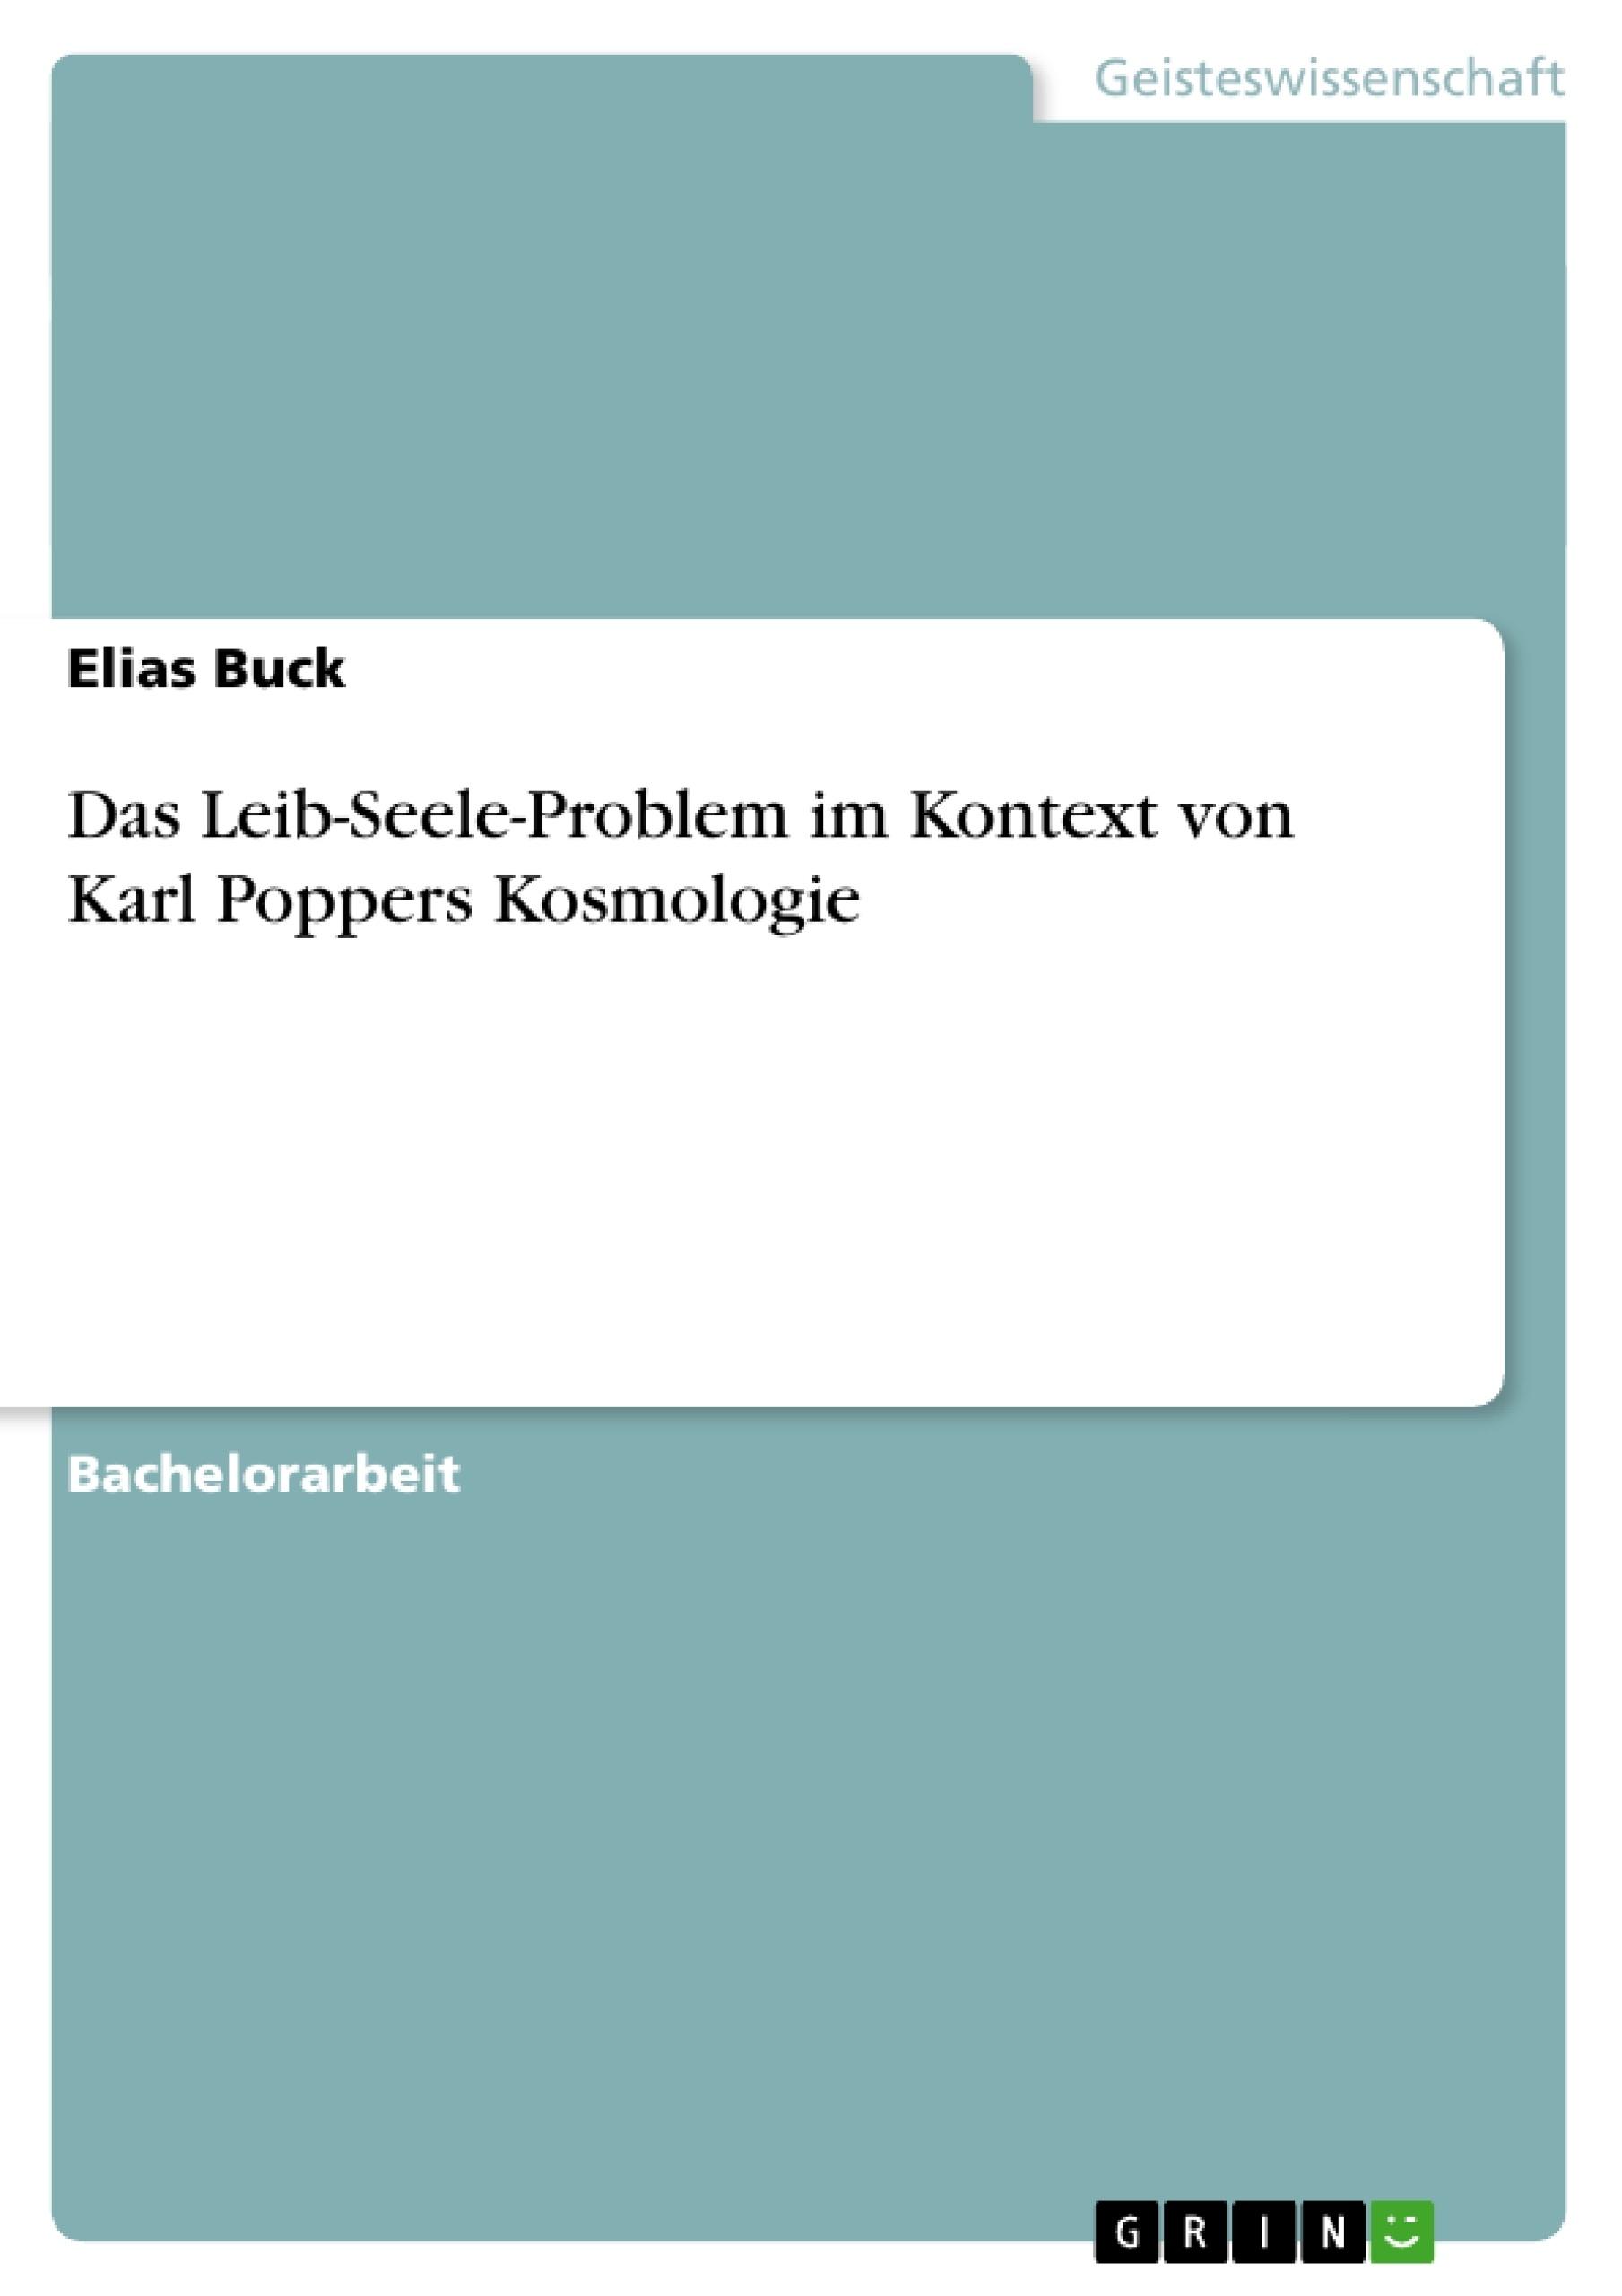 Titel: Das Leib-Seele-Problem im Kontext von Karl Poppers Kosmologie